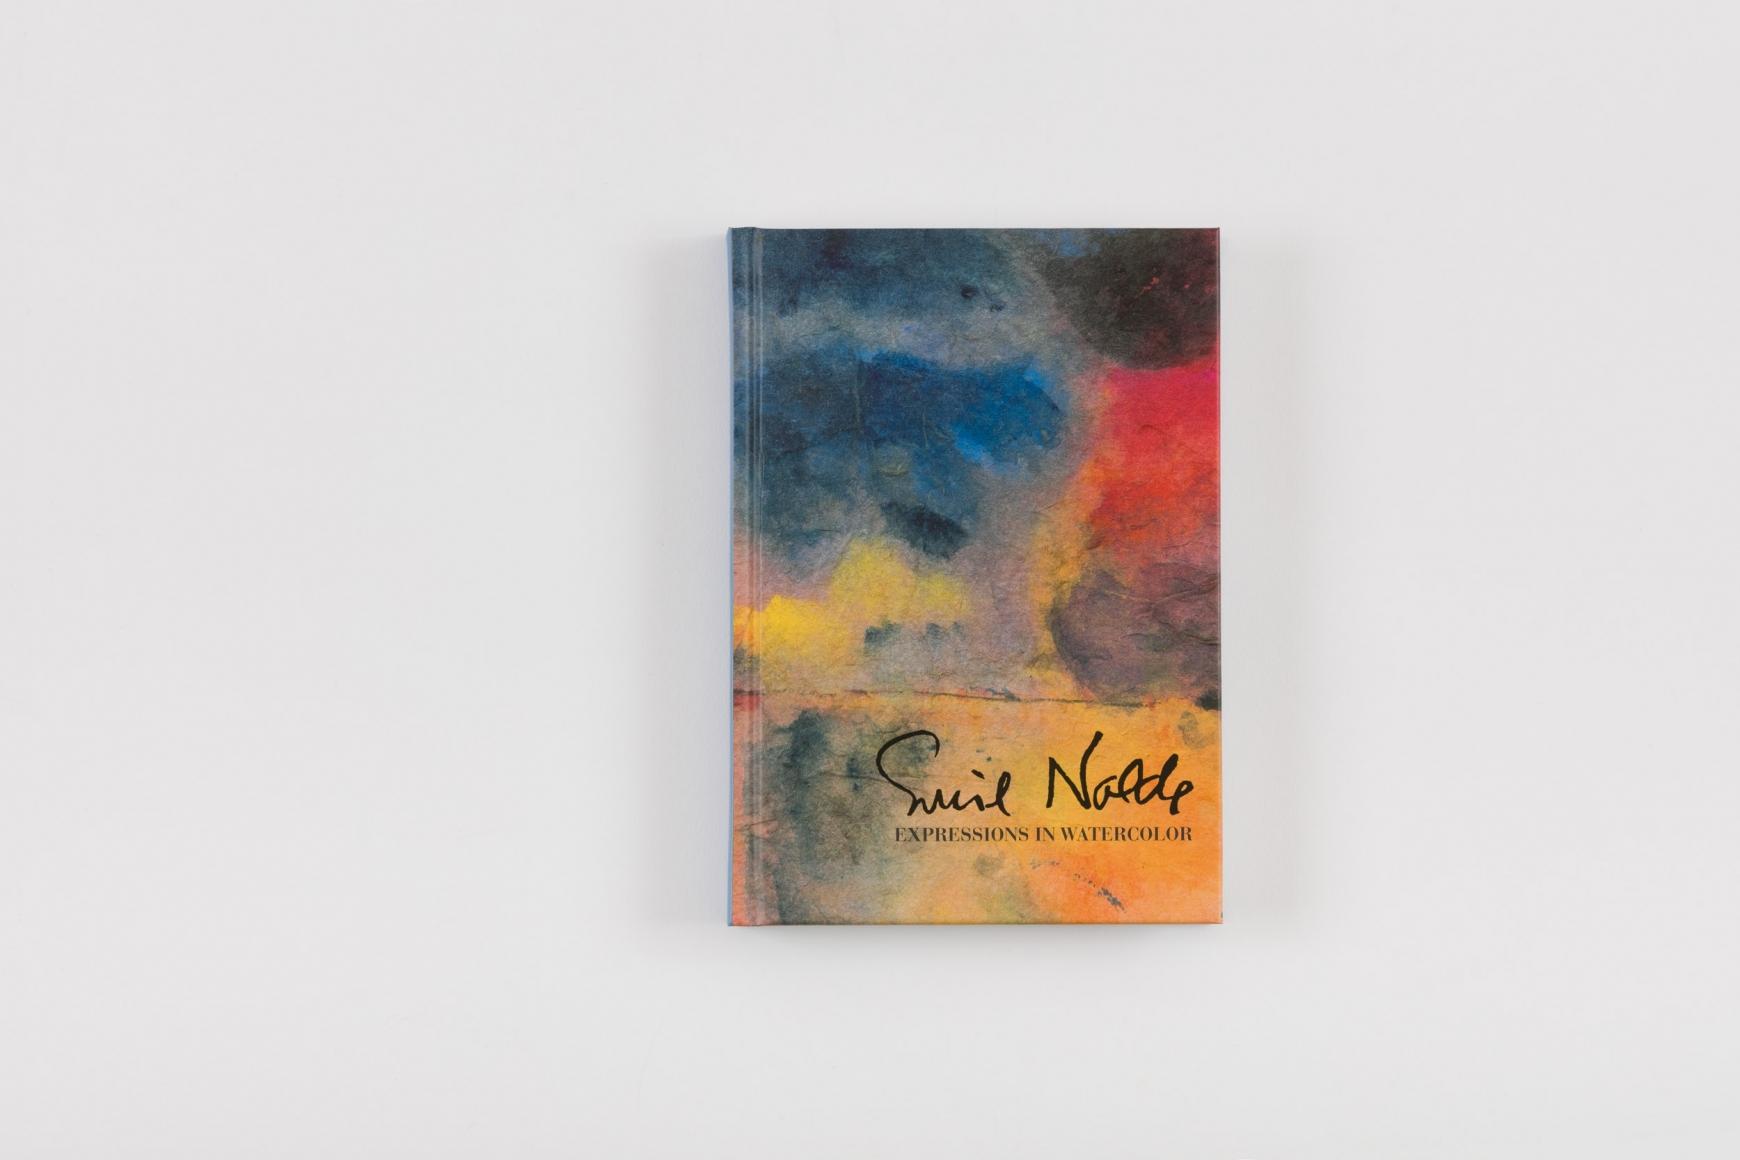 Emil Nolde: Expressions in Watercolor - Books & Editions - Van Doren ...